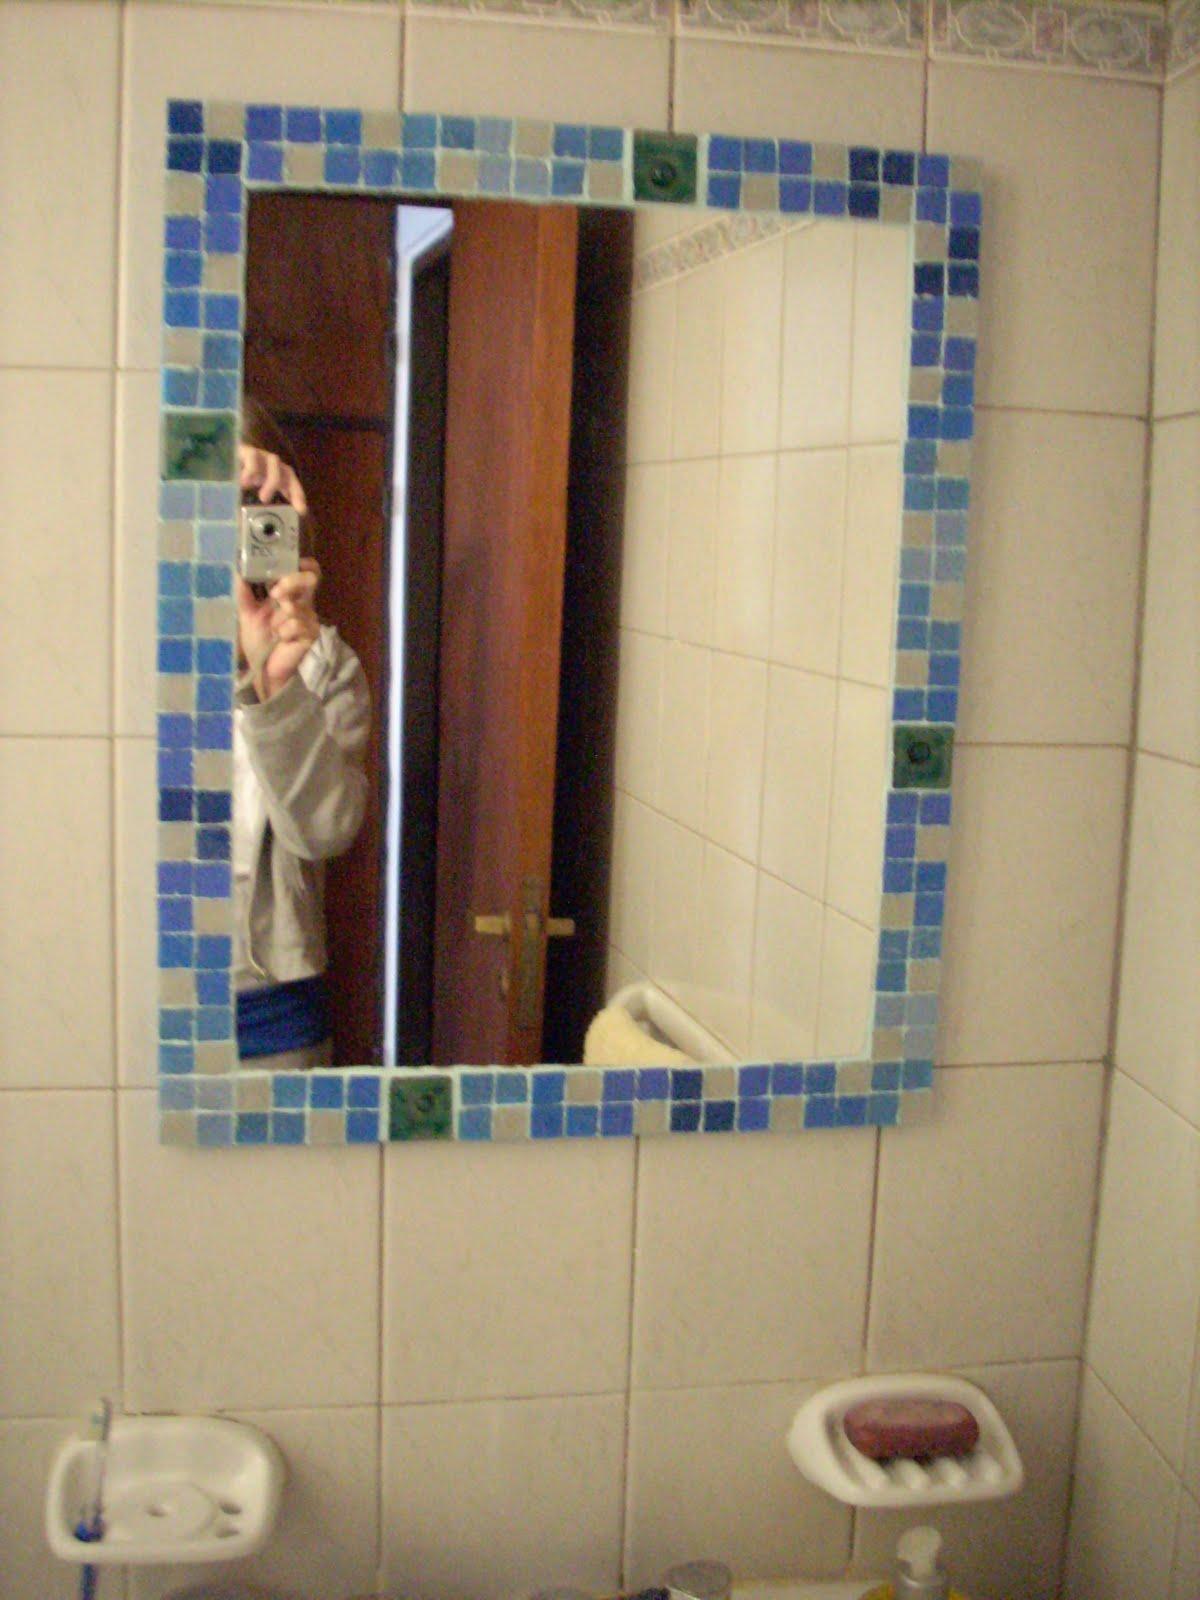 Lamparas para espejo de bano dise os arquitect nicos - Espejo bano luz integrada ...